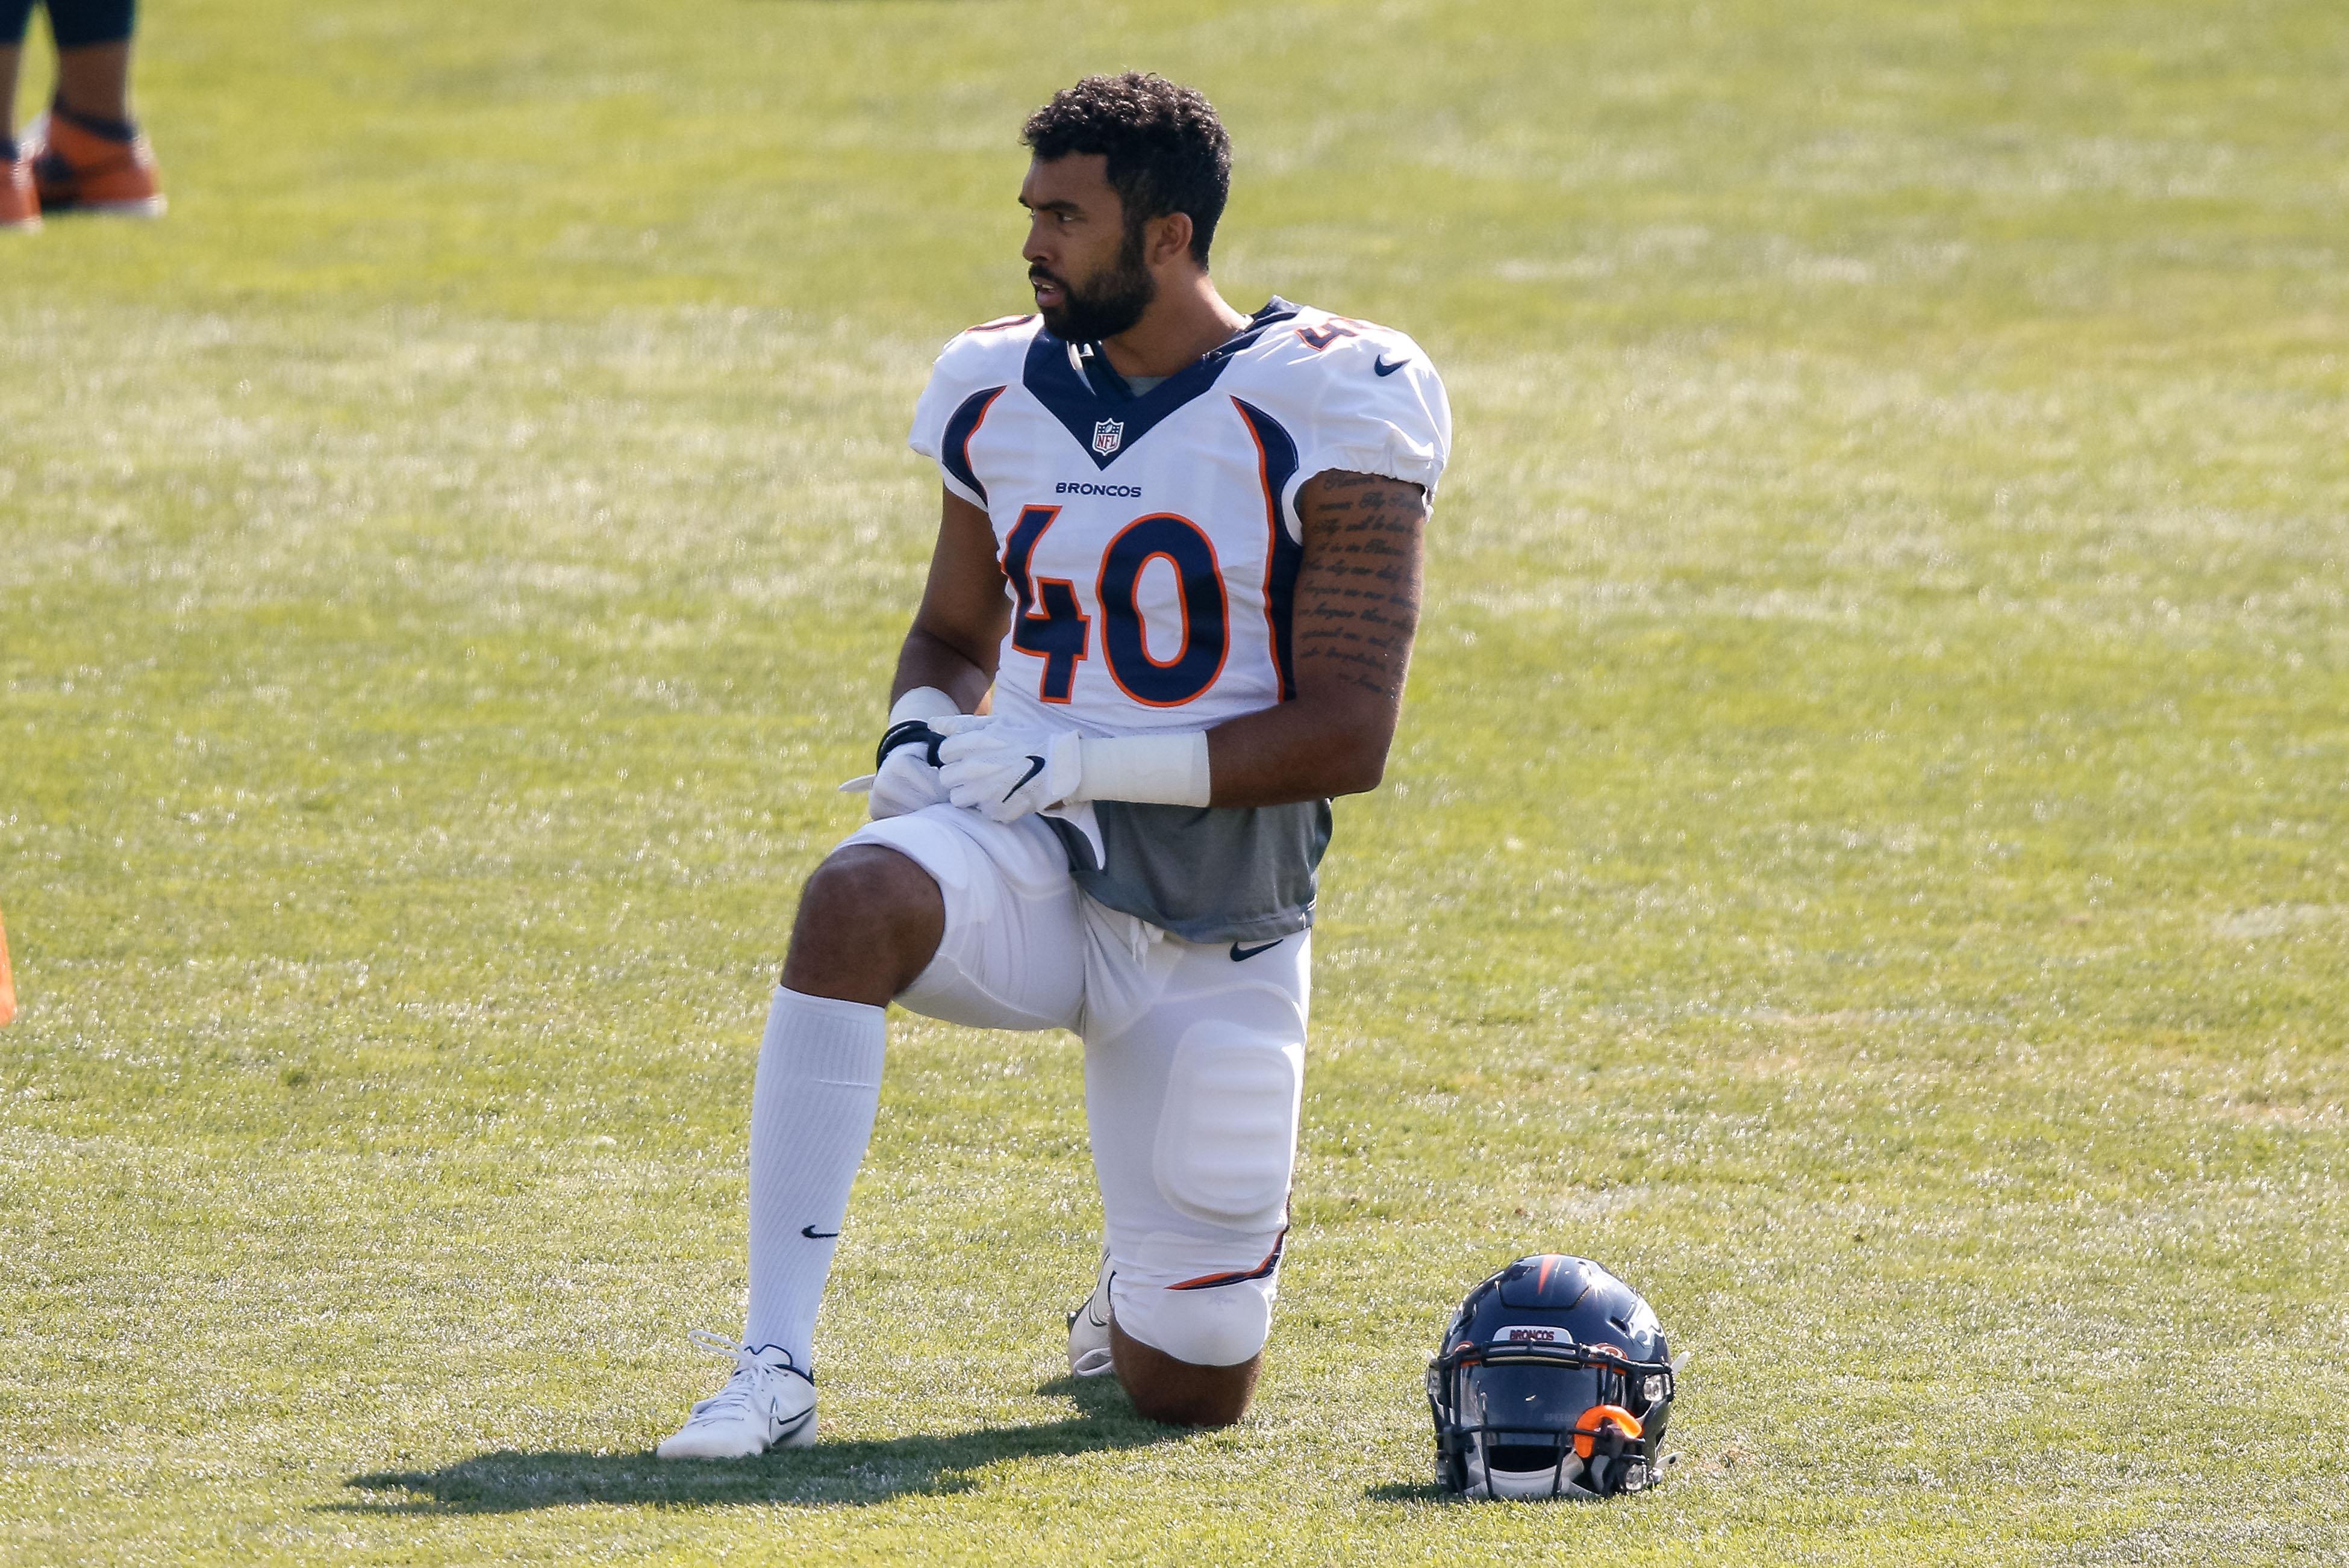 Denver Broncos linebacker Justin Strnad (40) during training camp at Dove Valley.